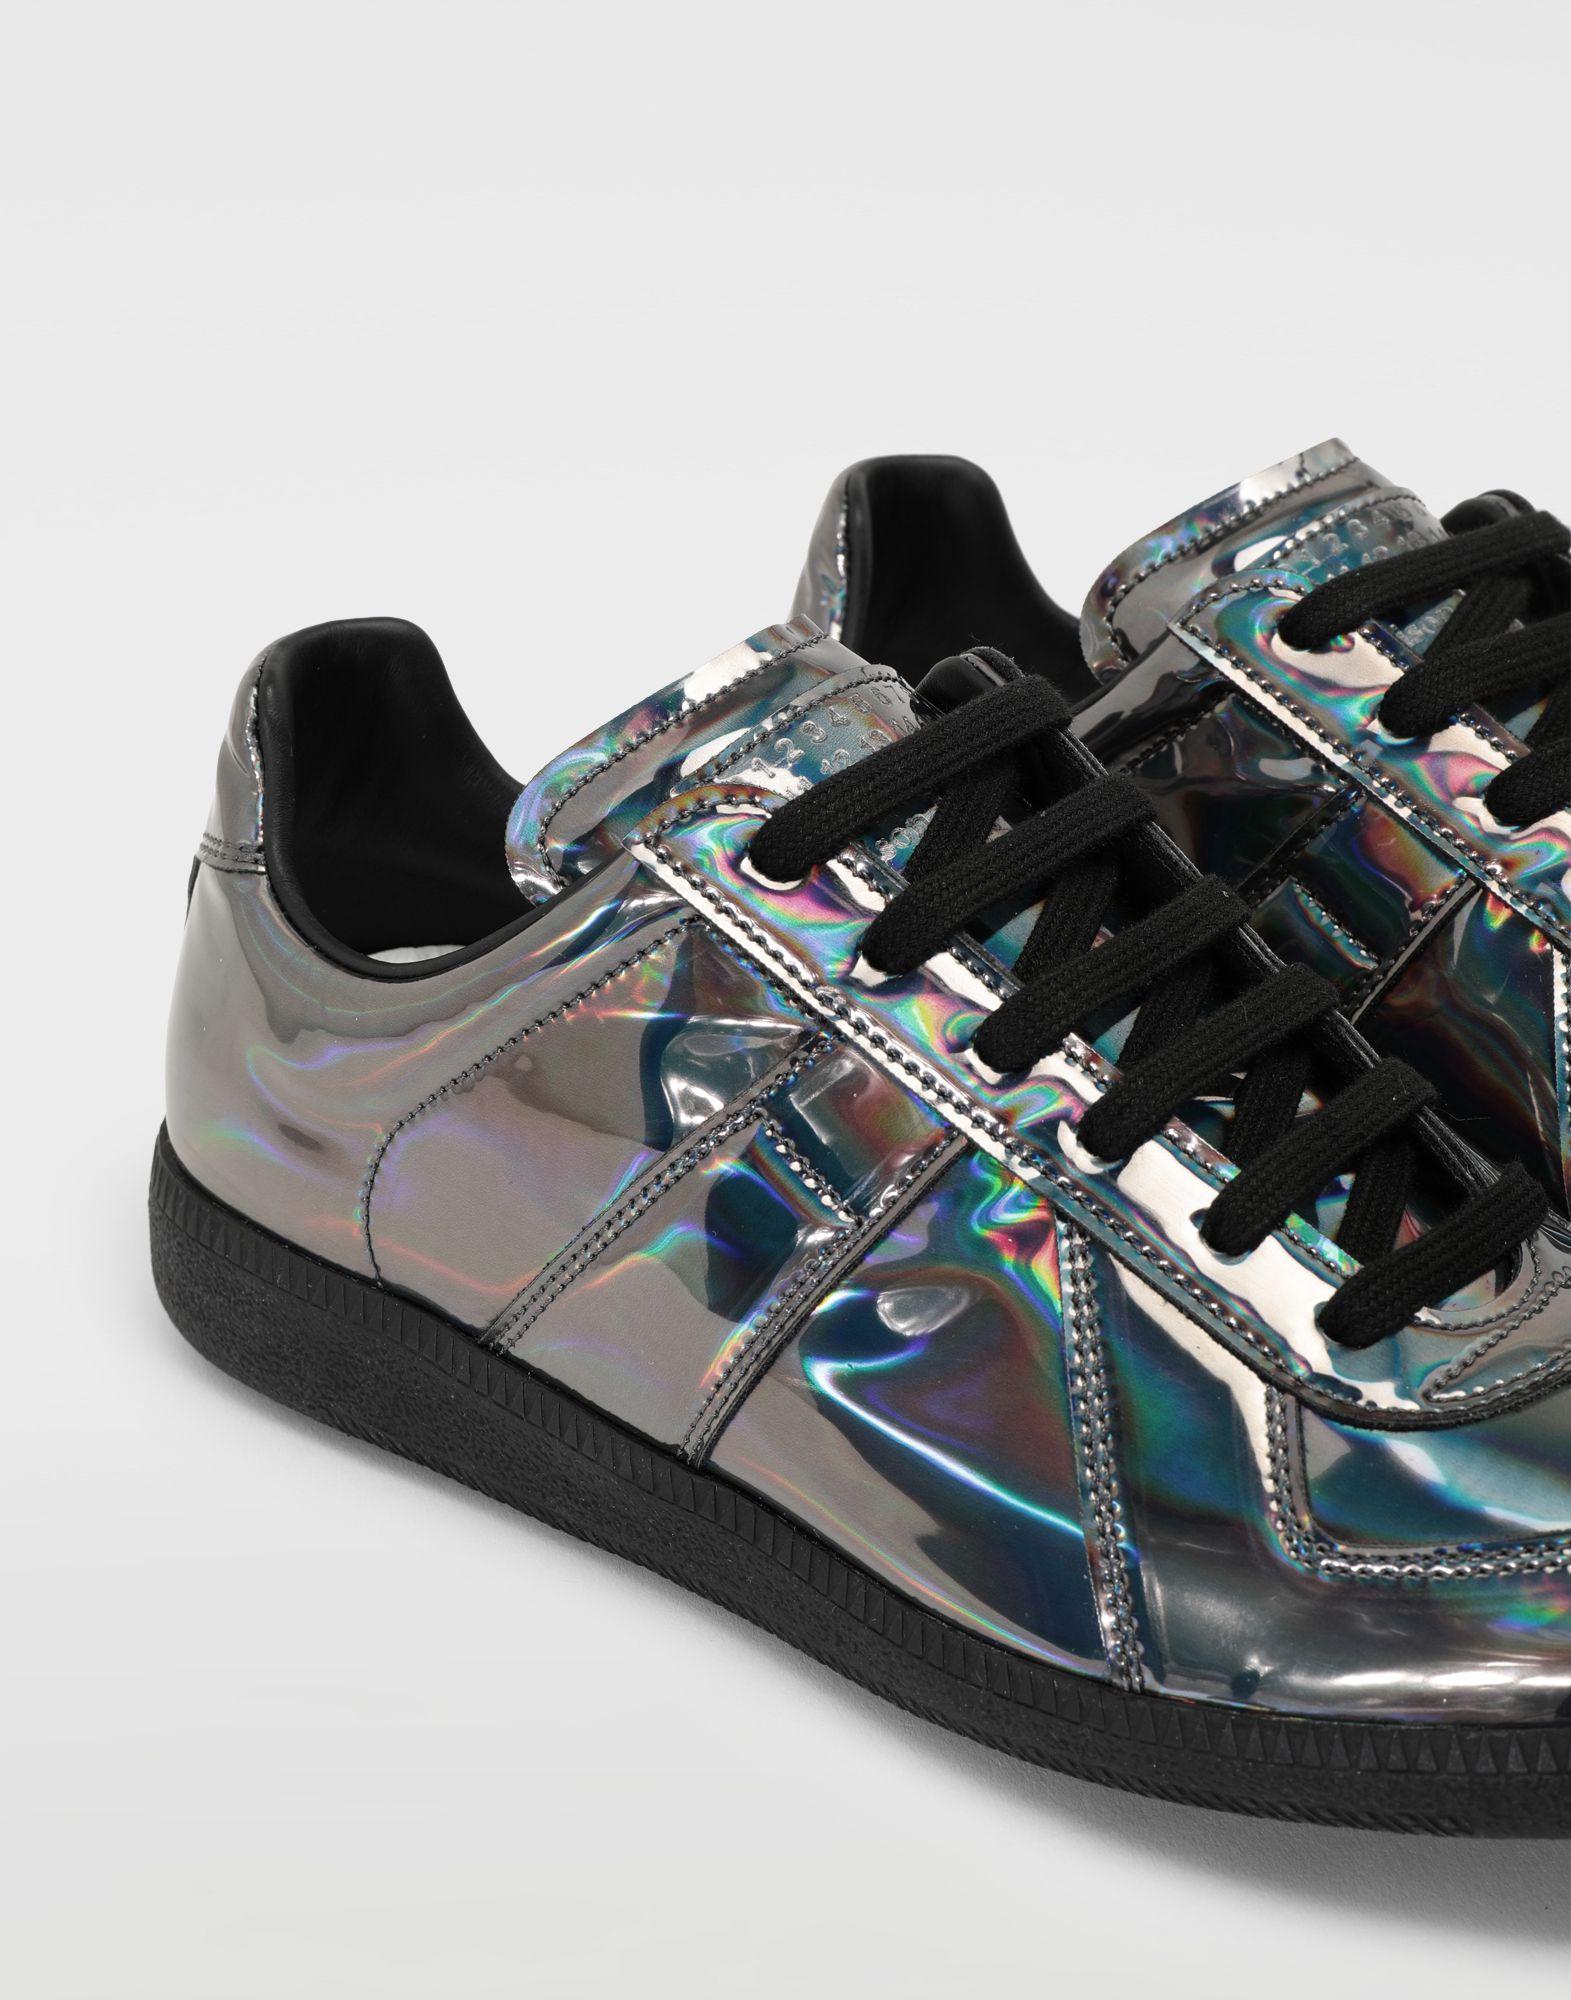 MAISON MARGIELA Replica low top hologram sneakers Sneakers Man a